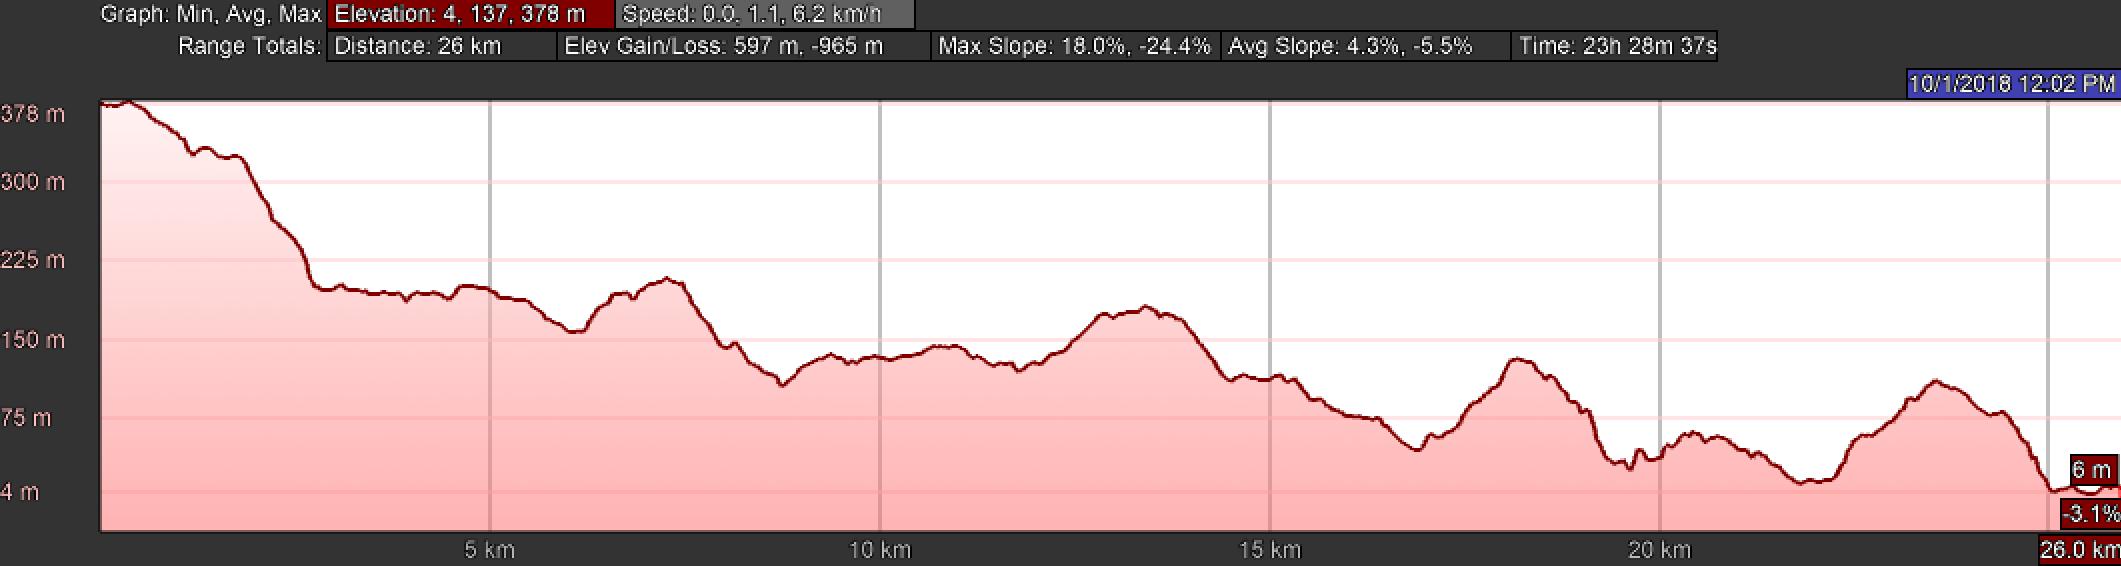 Elevation Profile, Day Three of the Camino Finisterre, Hospital to Muxía